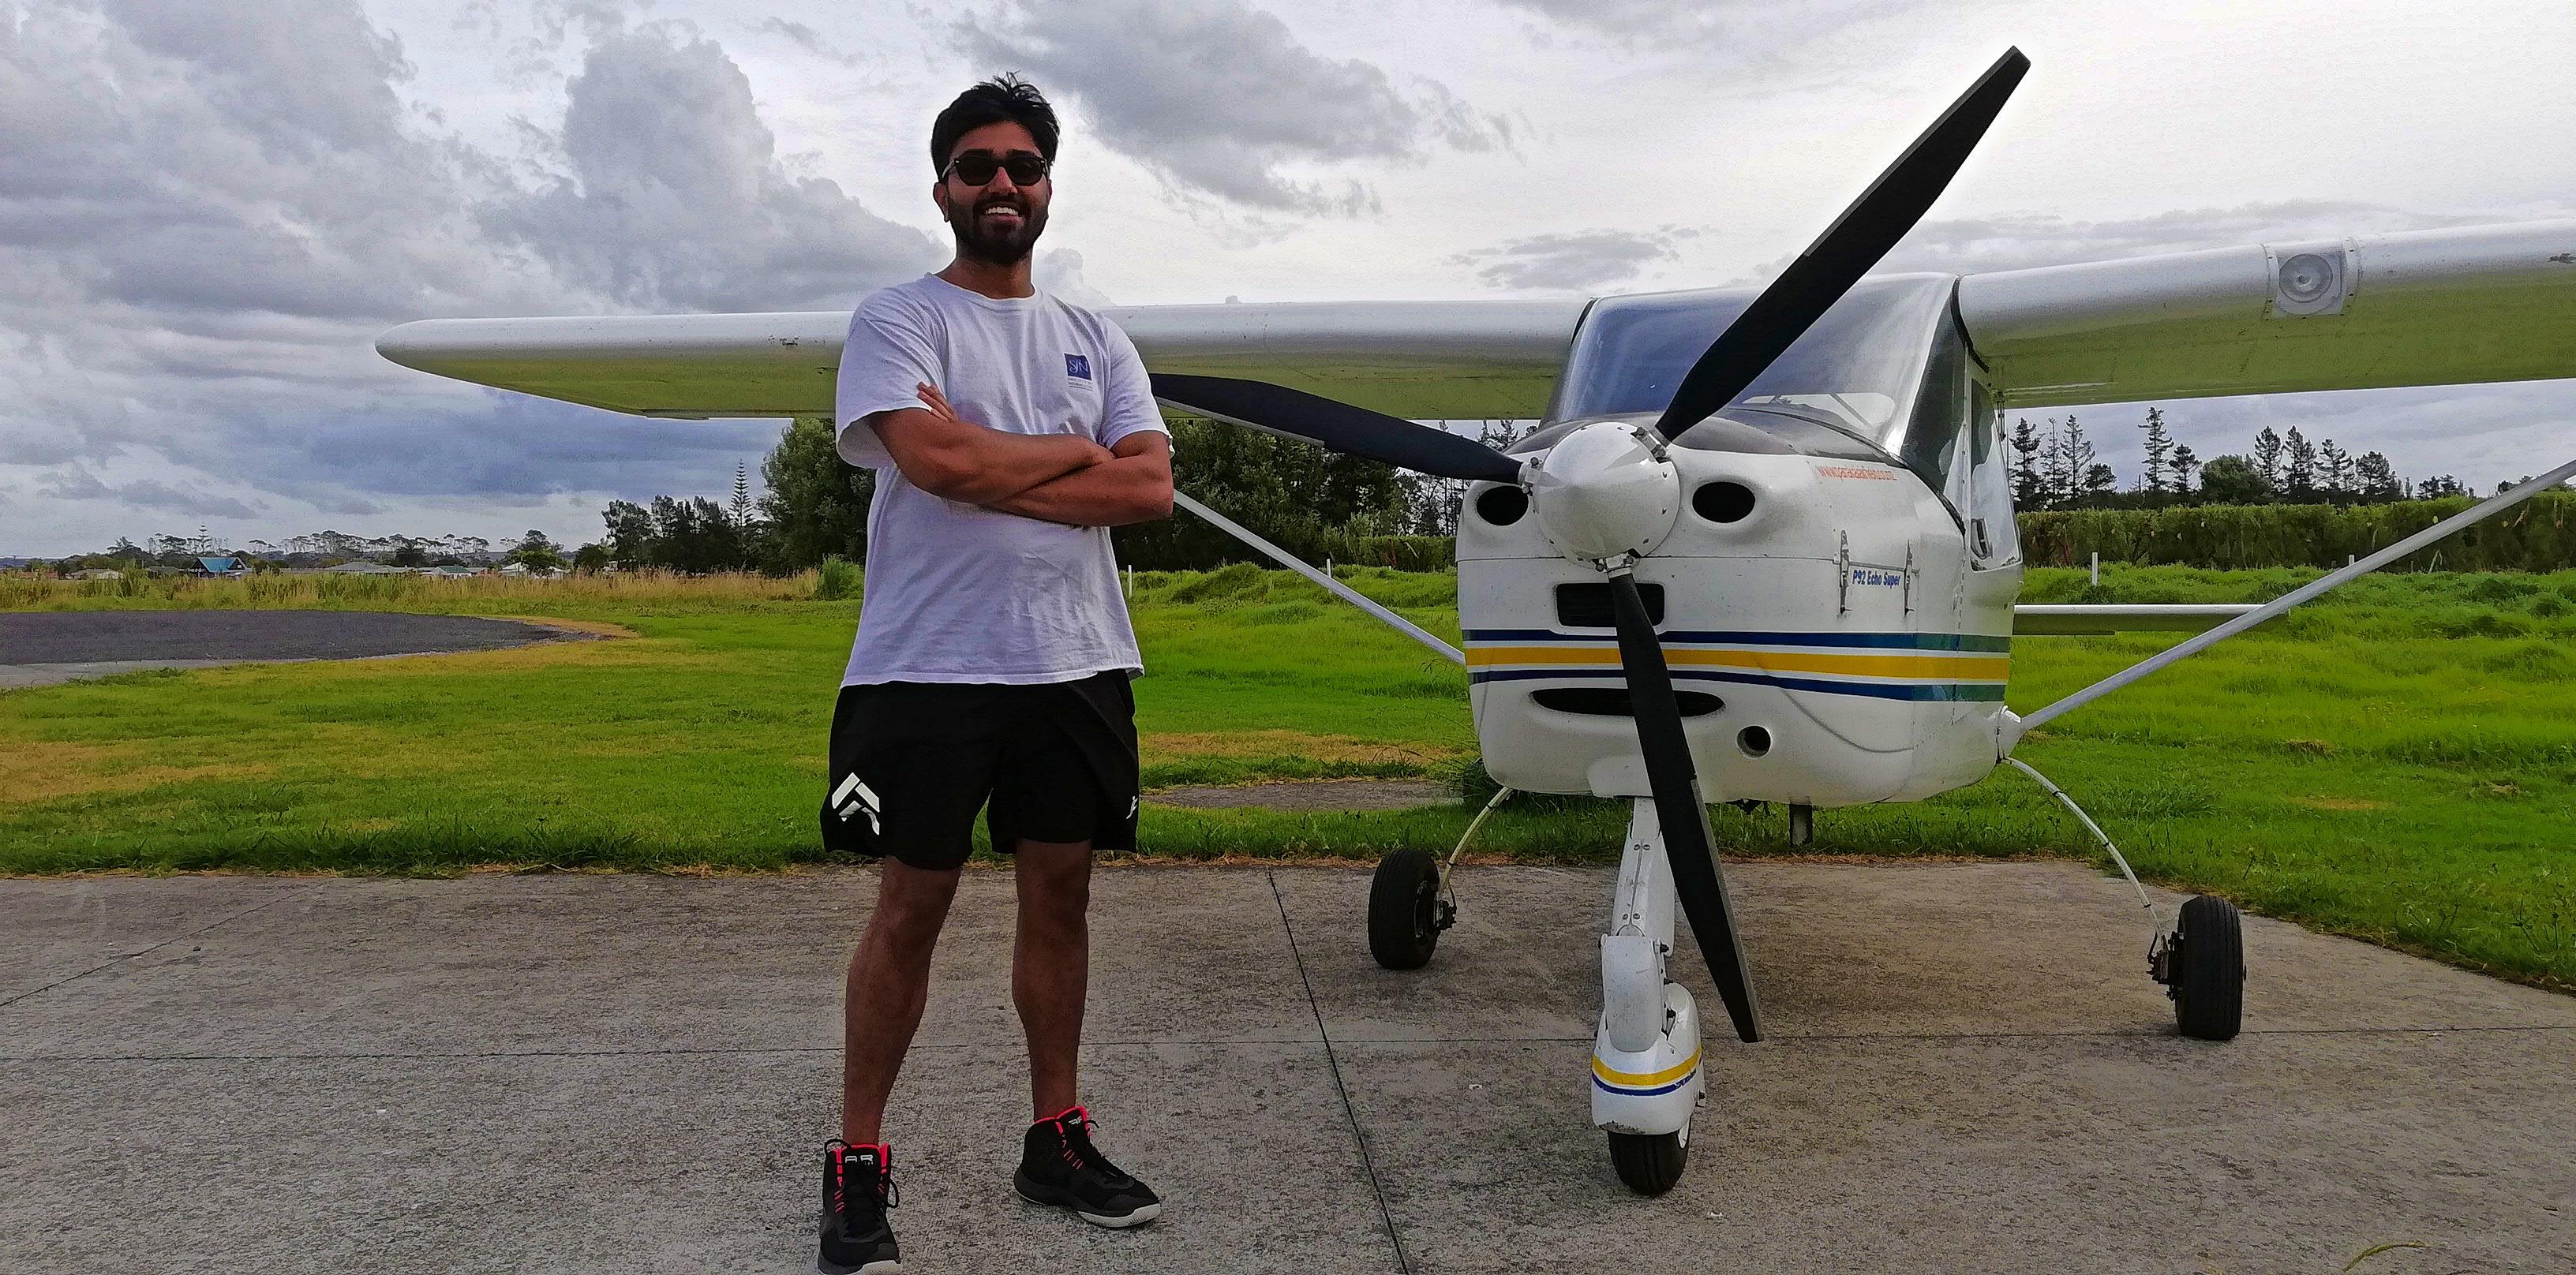 Rishi, after his trial flight